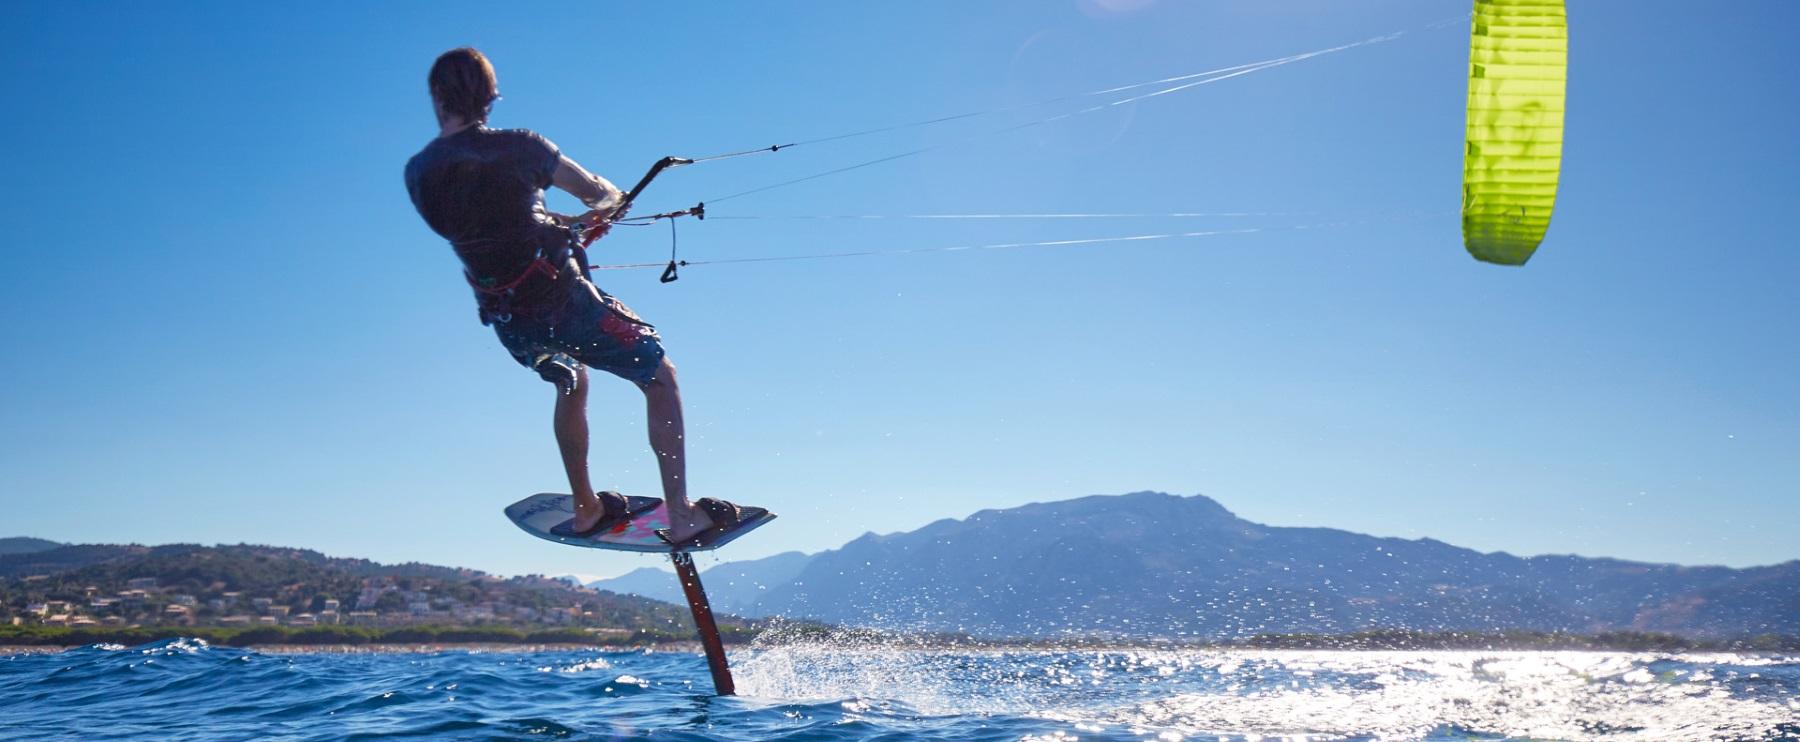 hydrofoil_kitesurfen